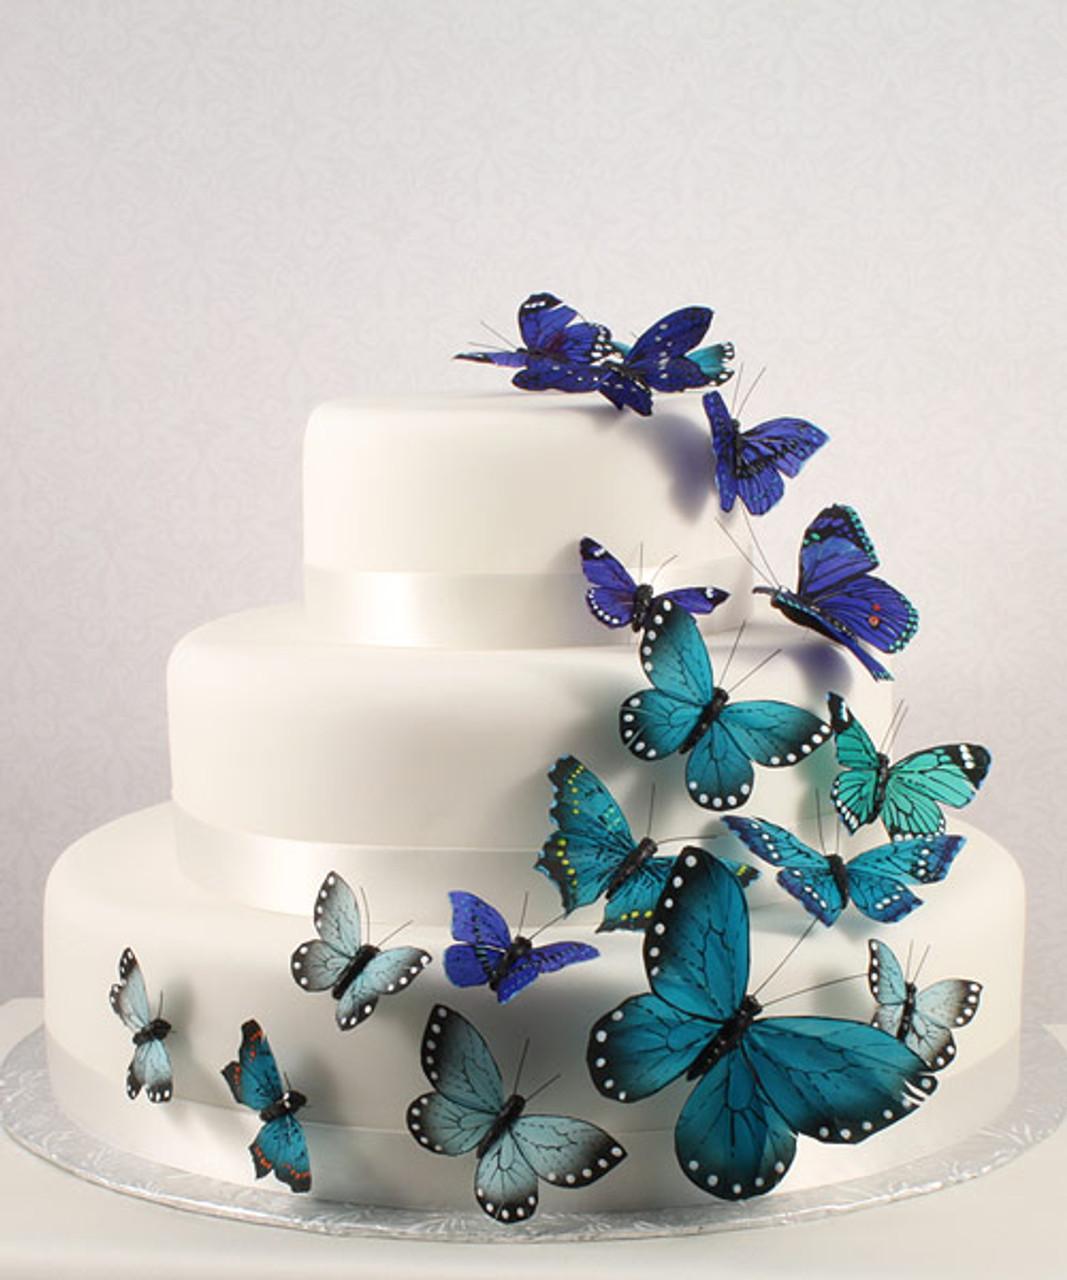 Quinceanera,quinceanera paris,quinceanera invitation,quinceanera favors,quinceanera centerpiece,quinceanera dress,quinceanera cake topper